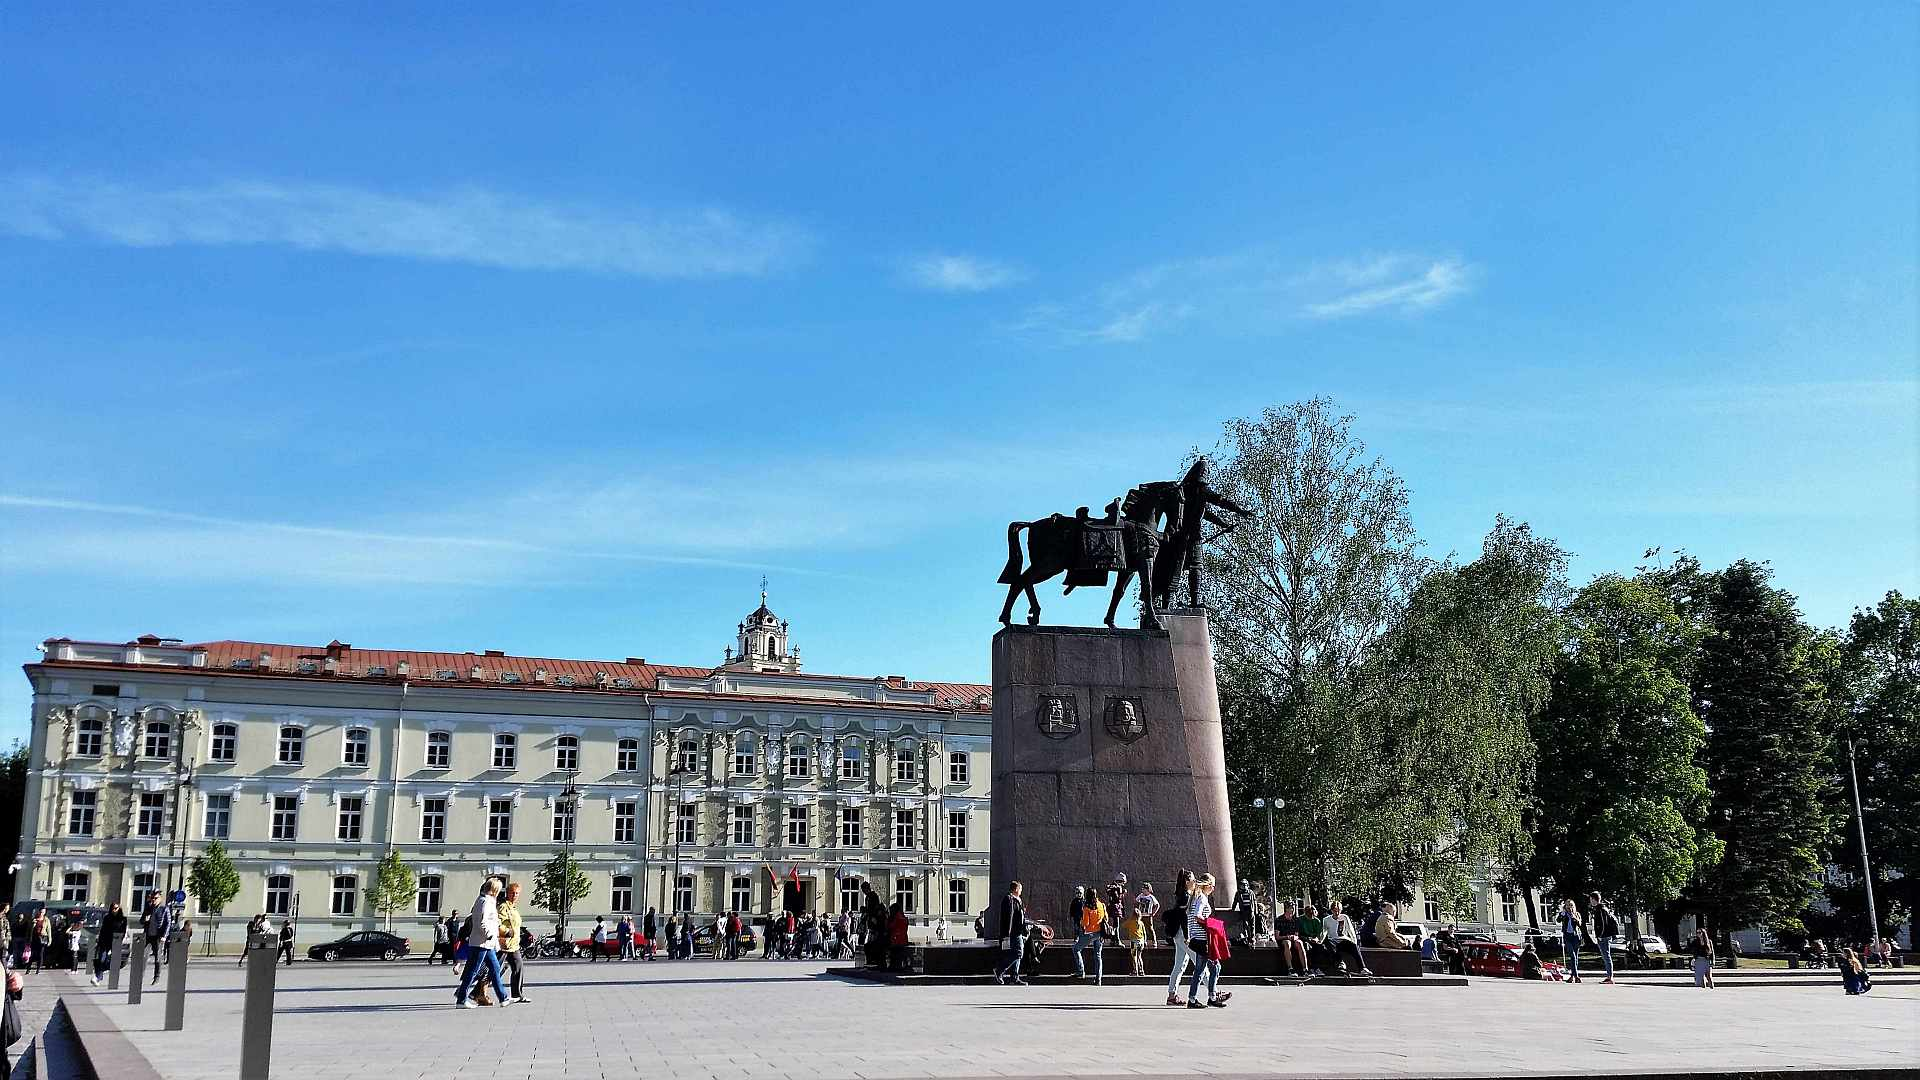 Cathedral Square Vilnius - Trivo.ro